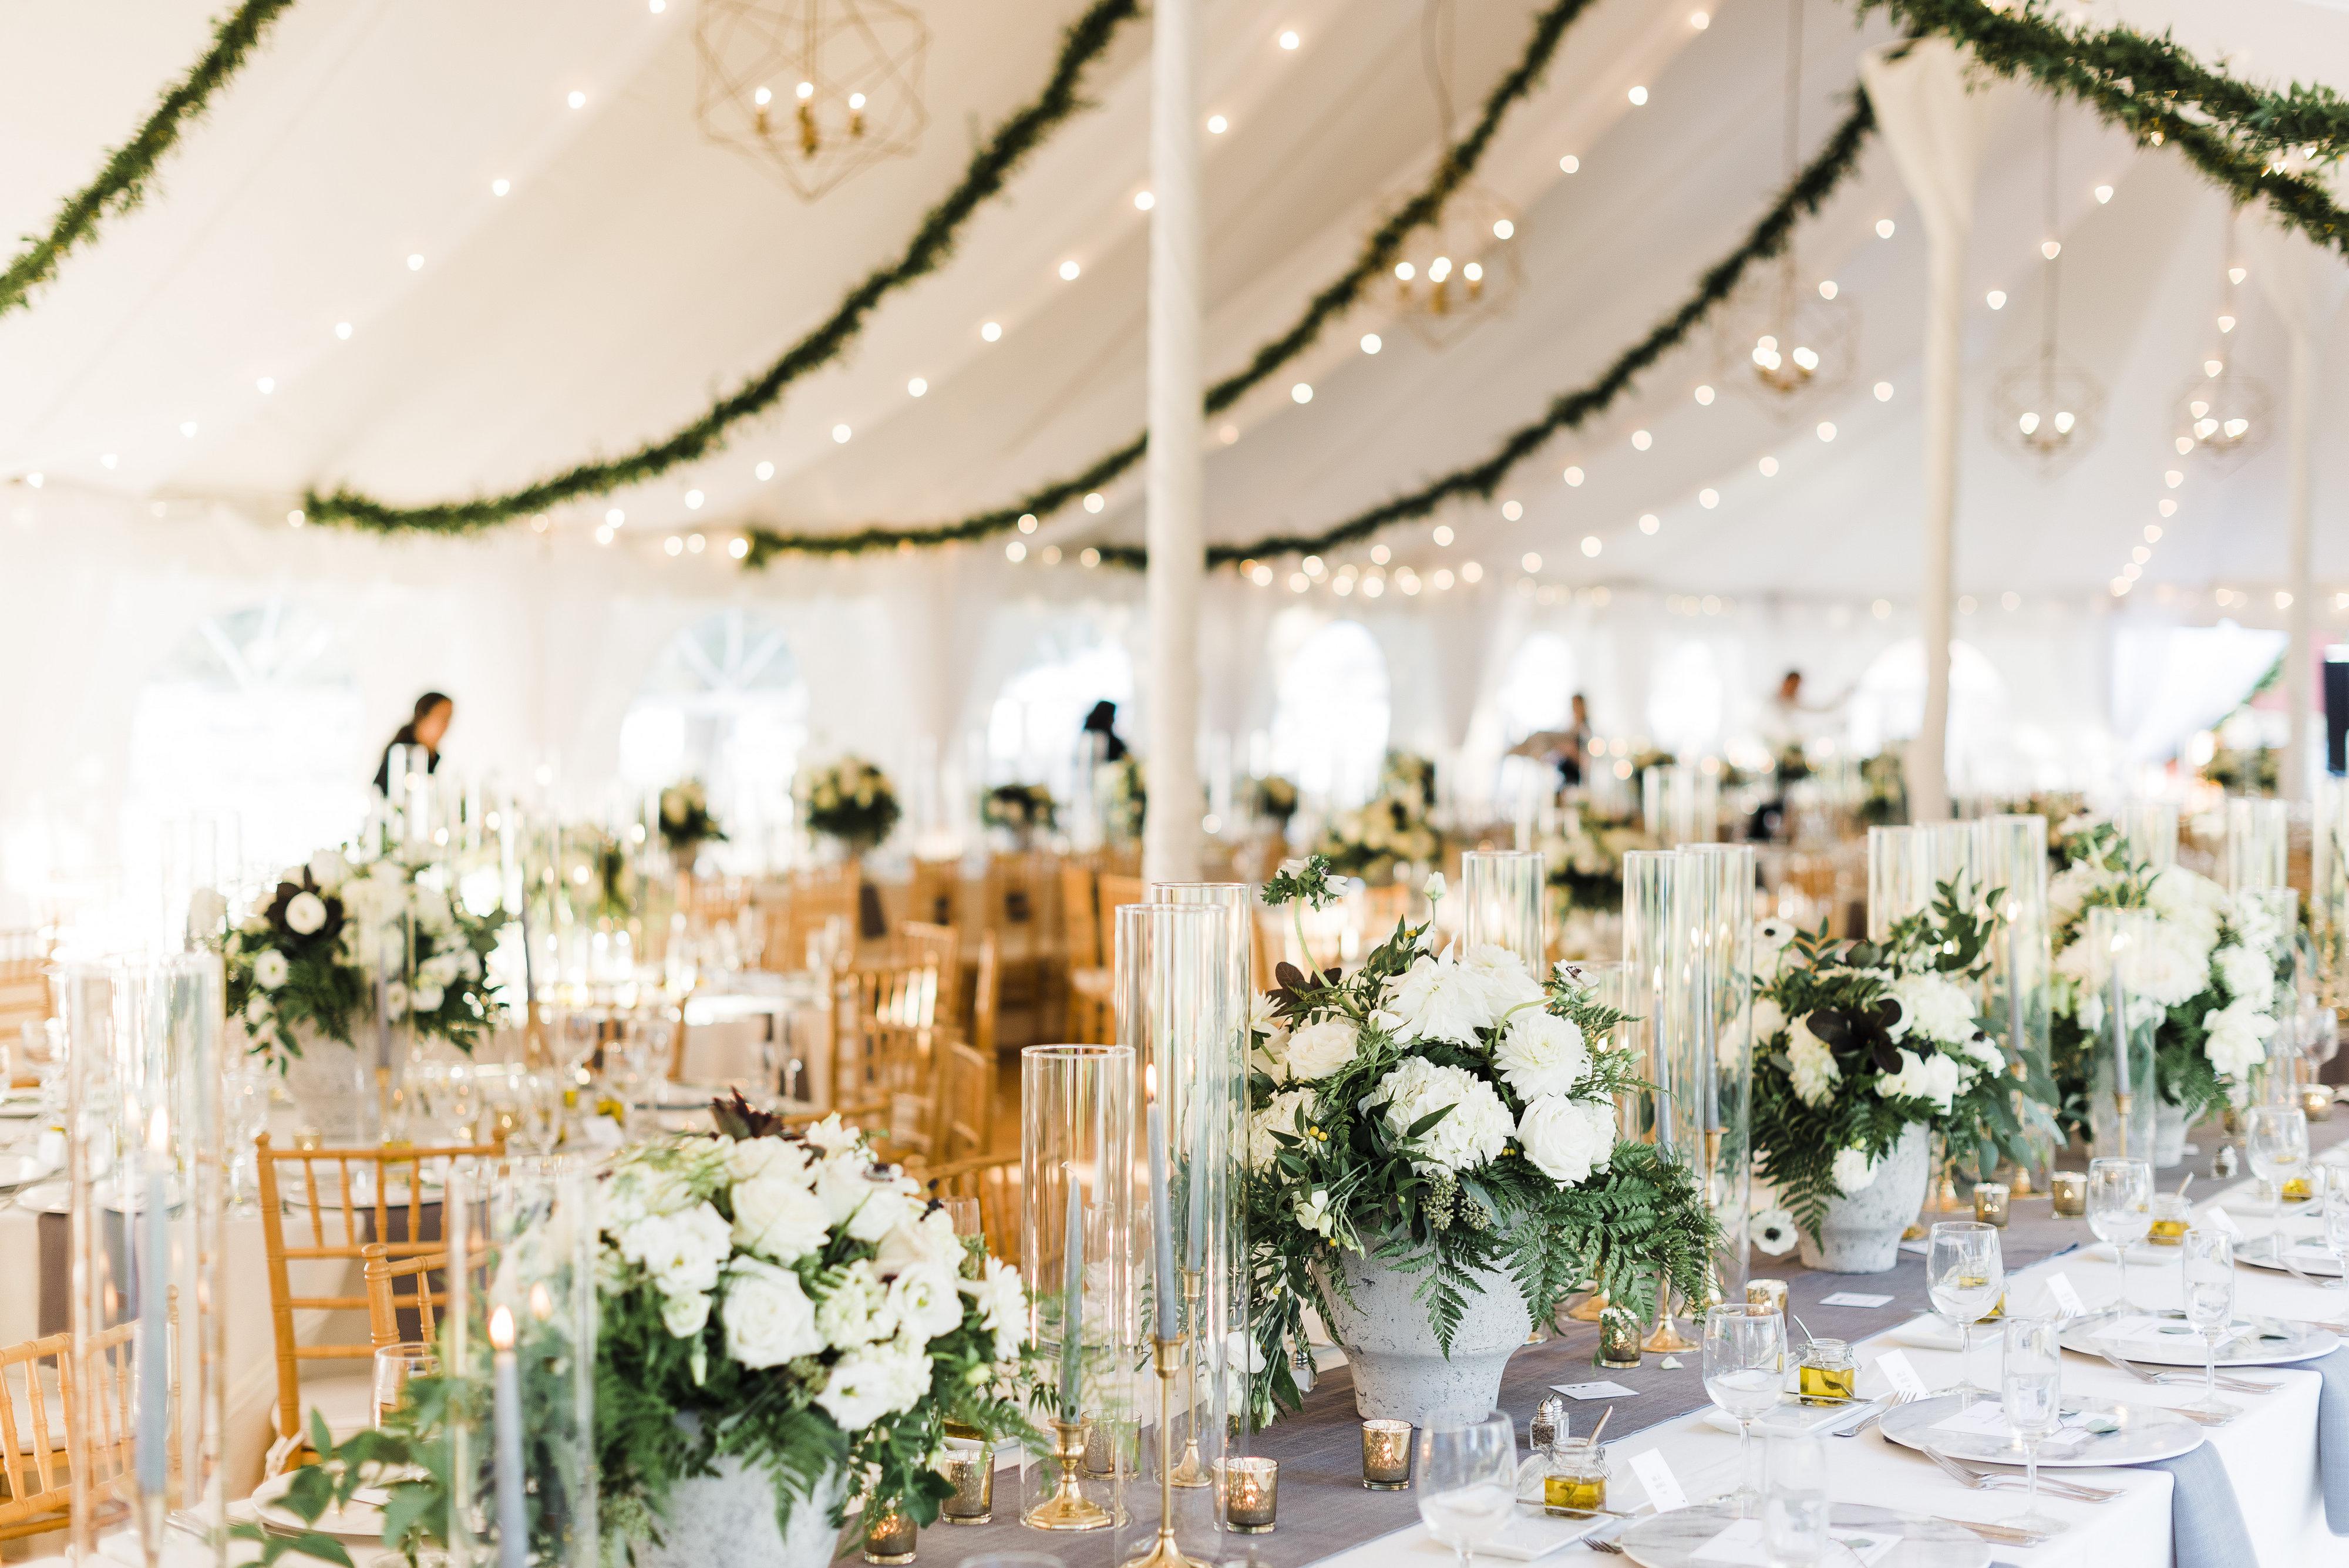 Weddings at Cornman Farms